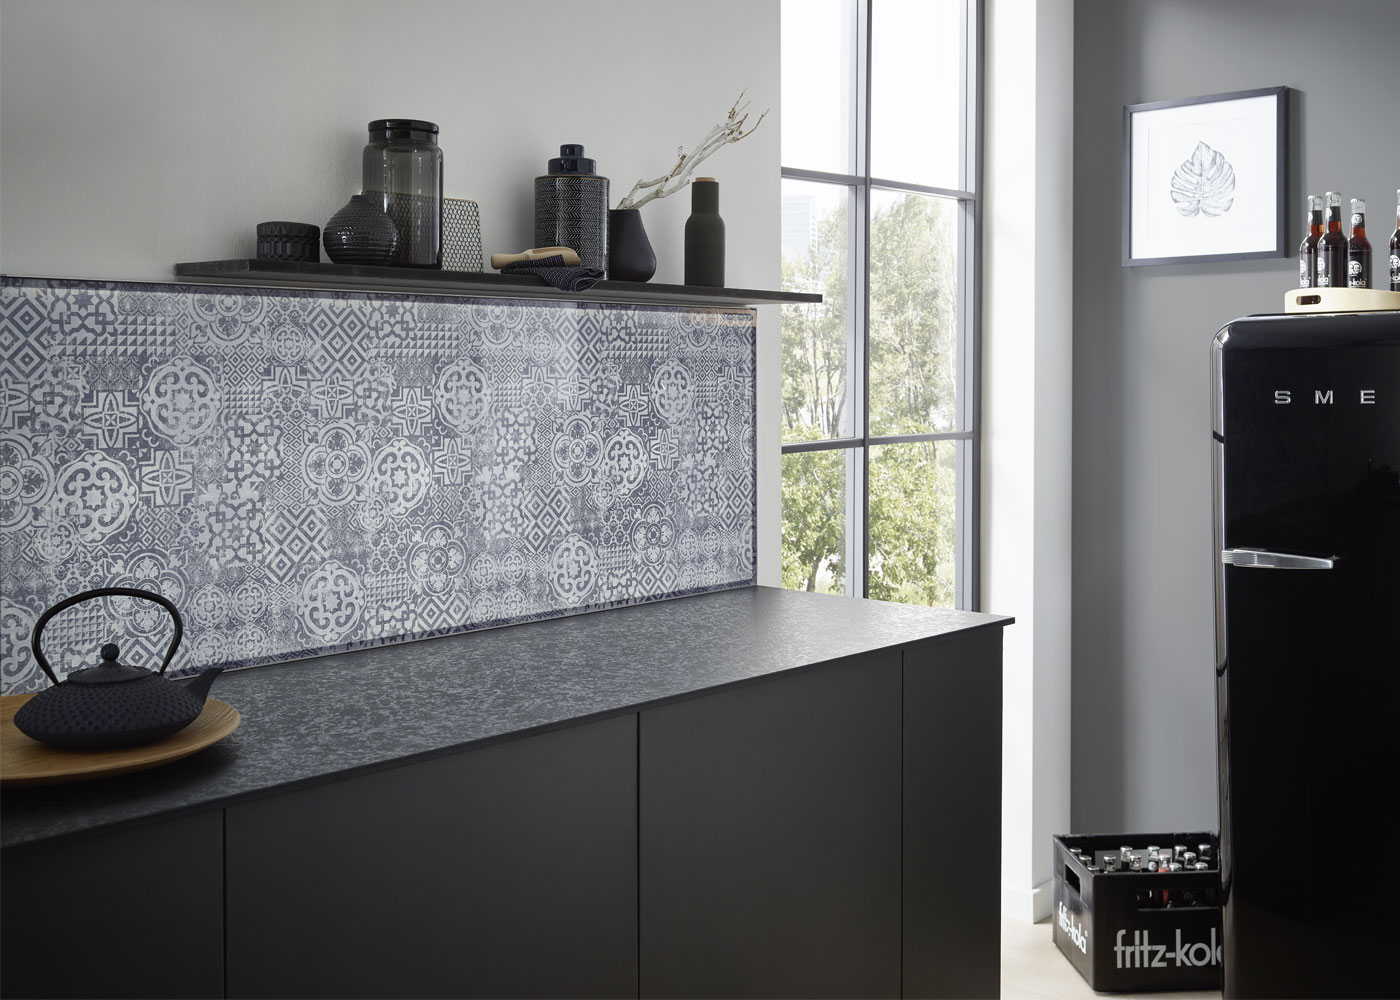 Full Size of Led Panel Küchendecke Led Panel Küche Test Led Panel In Küche Küche Mit Led Panel Küche Led Panel Küche